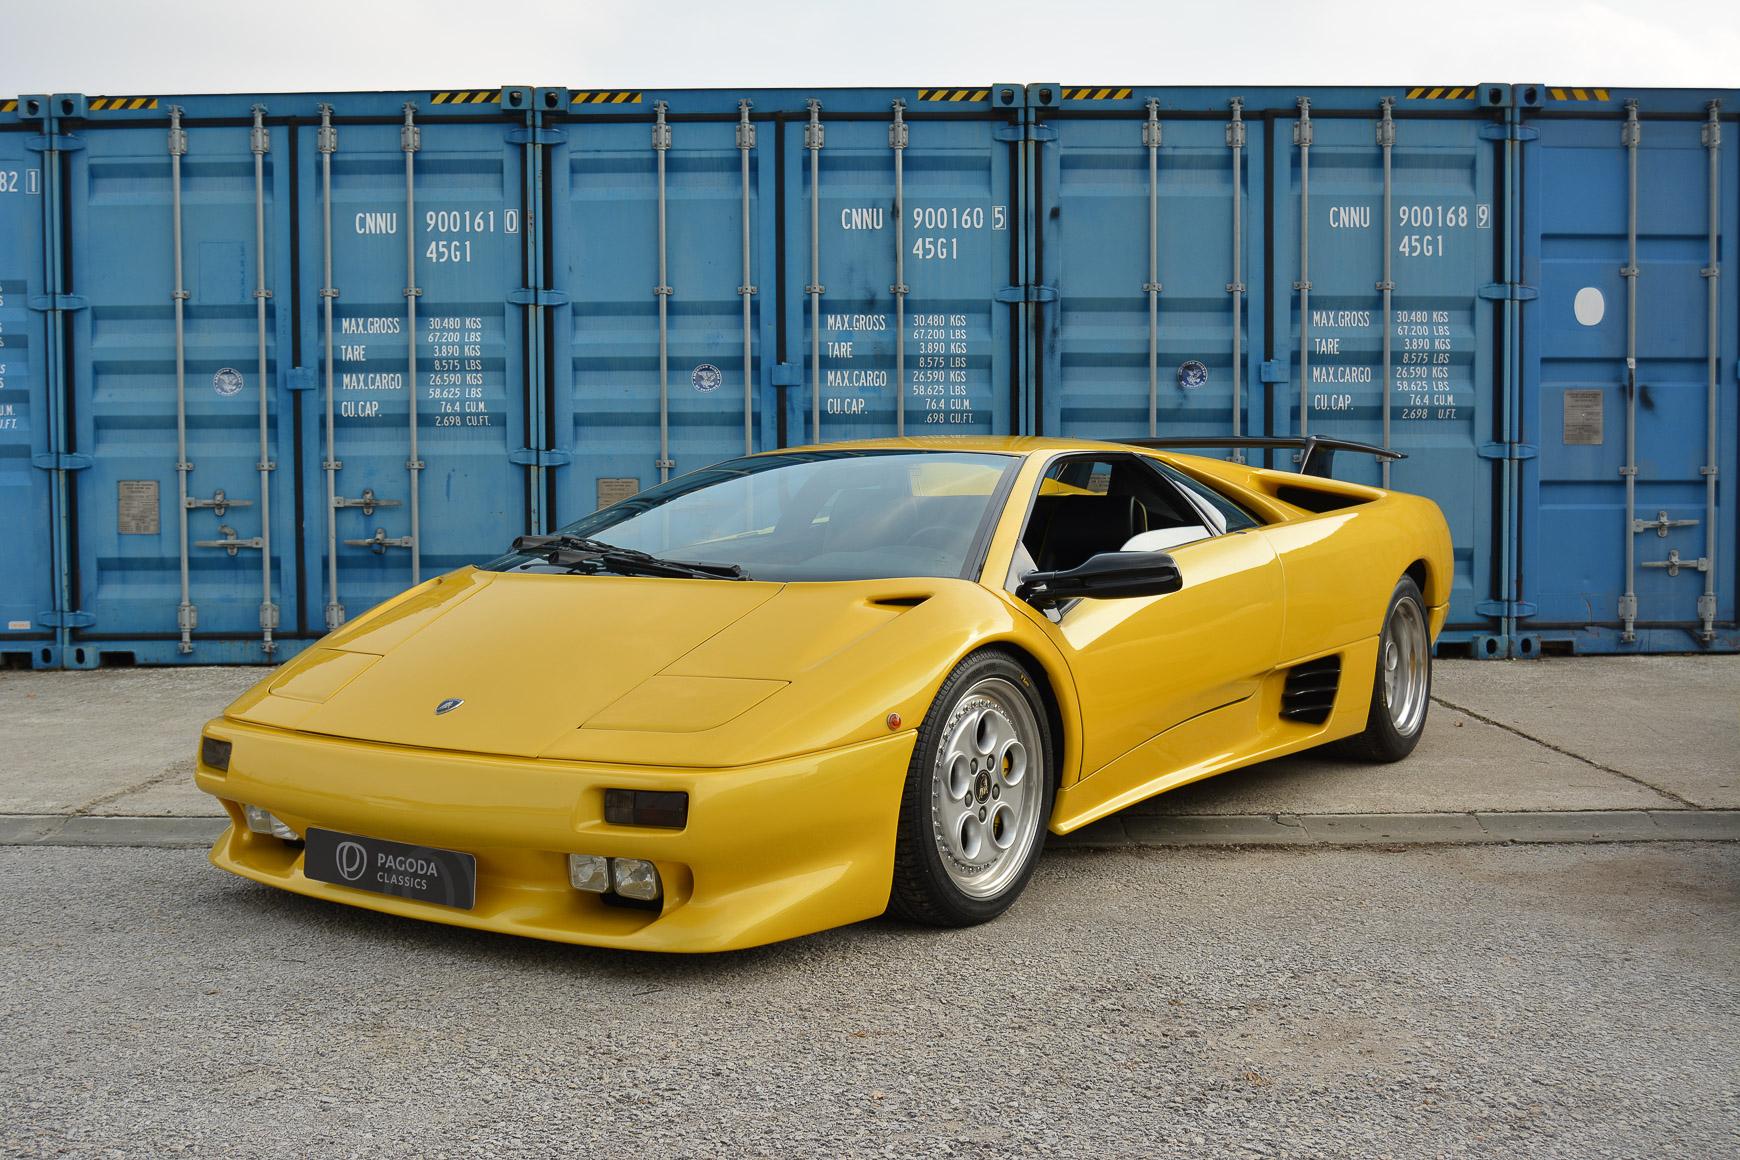 Lamborghini Diablo 1994 Pagoda Classics